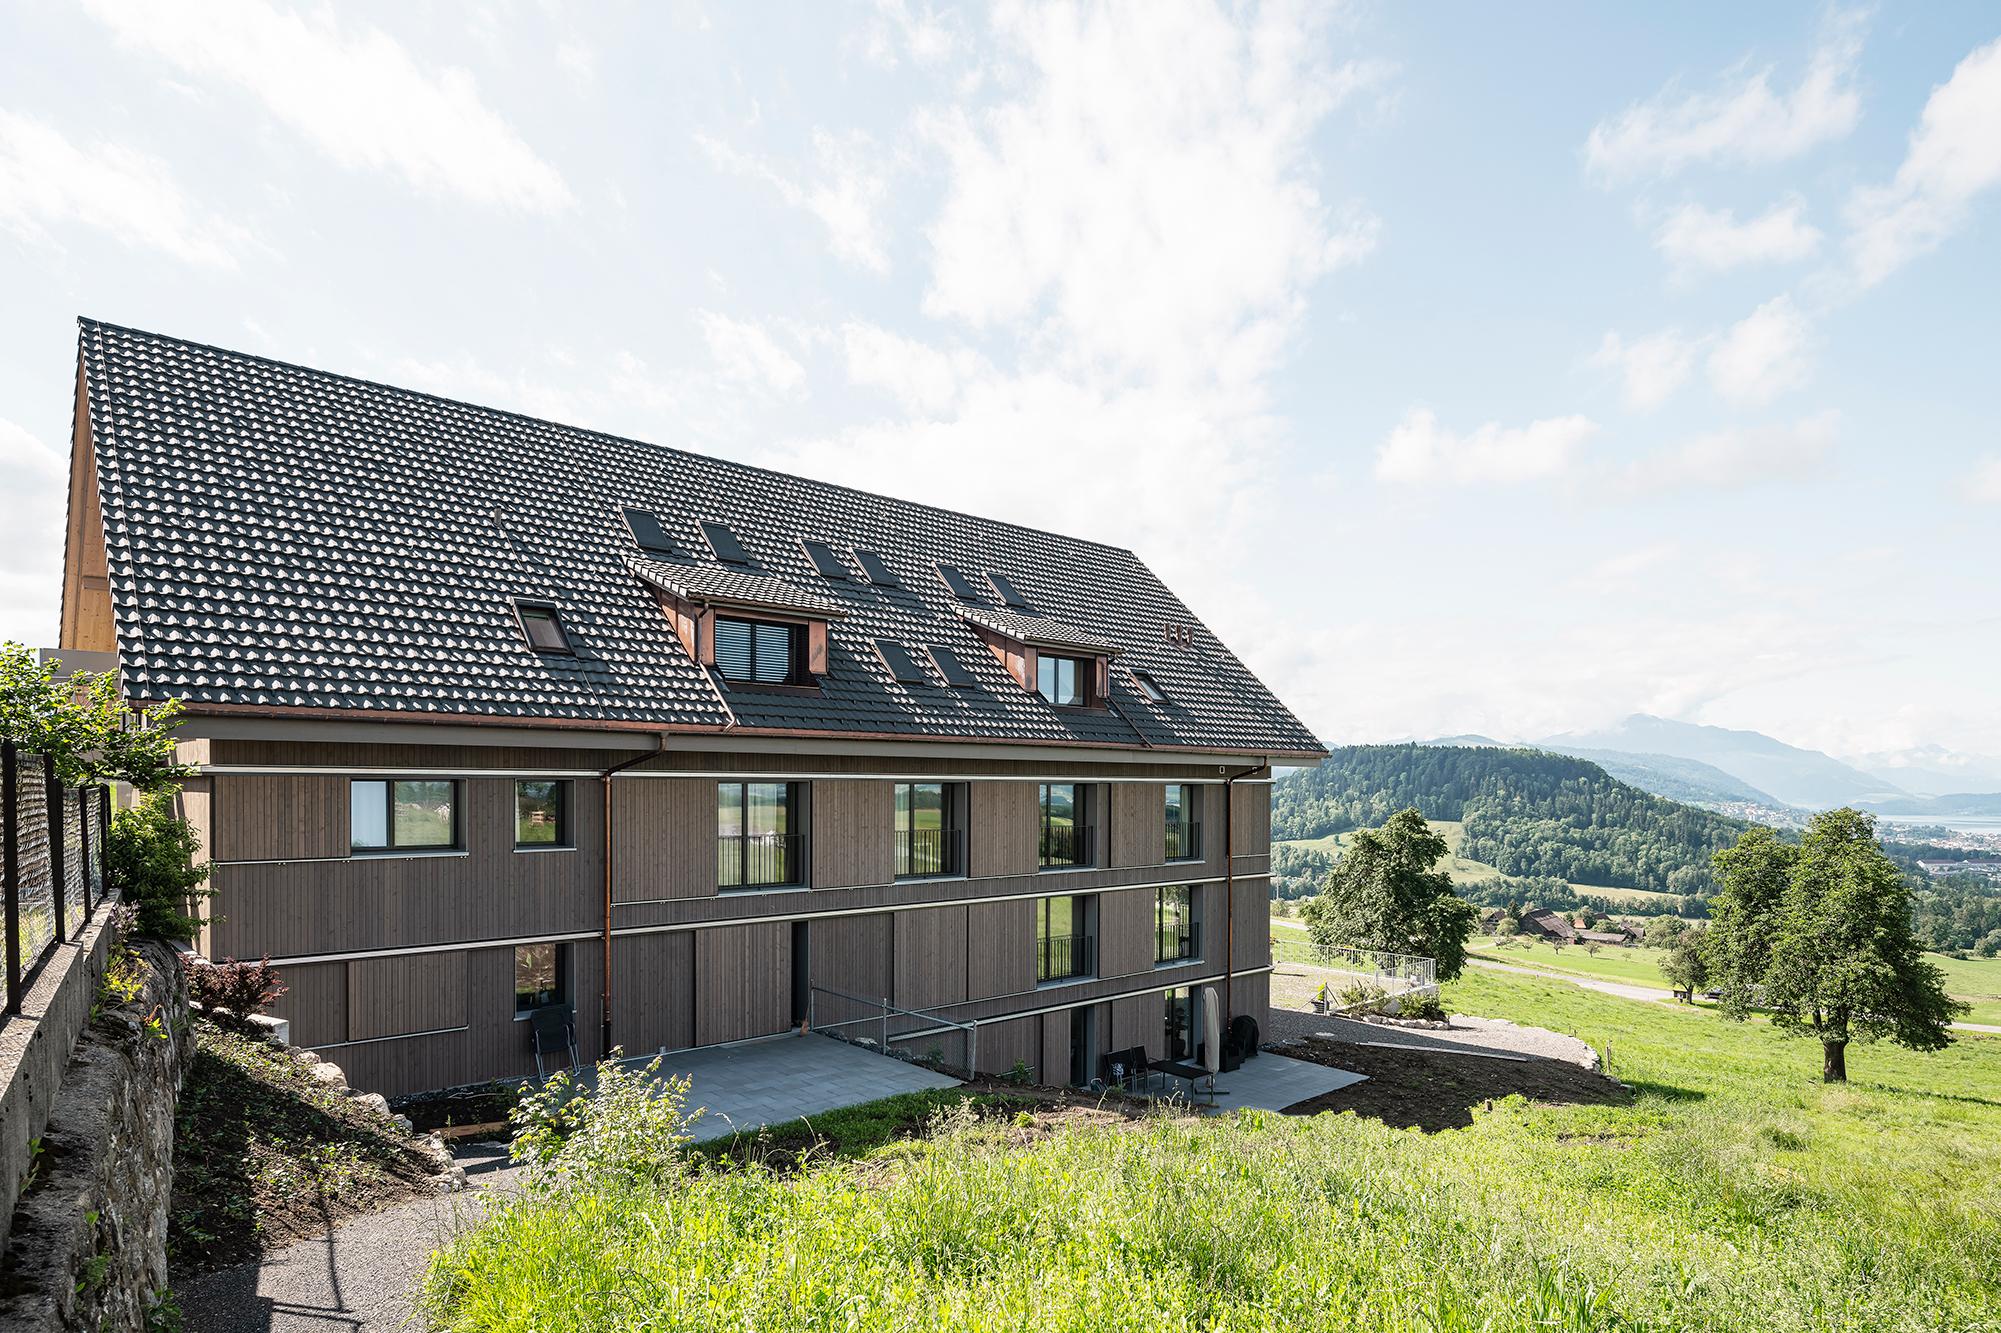 2142_8925 Ebertswil_Mehrfamilienhaus_Bild-2